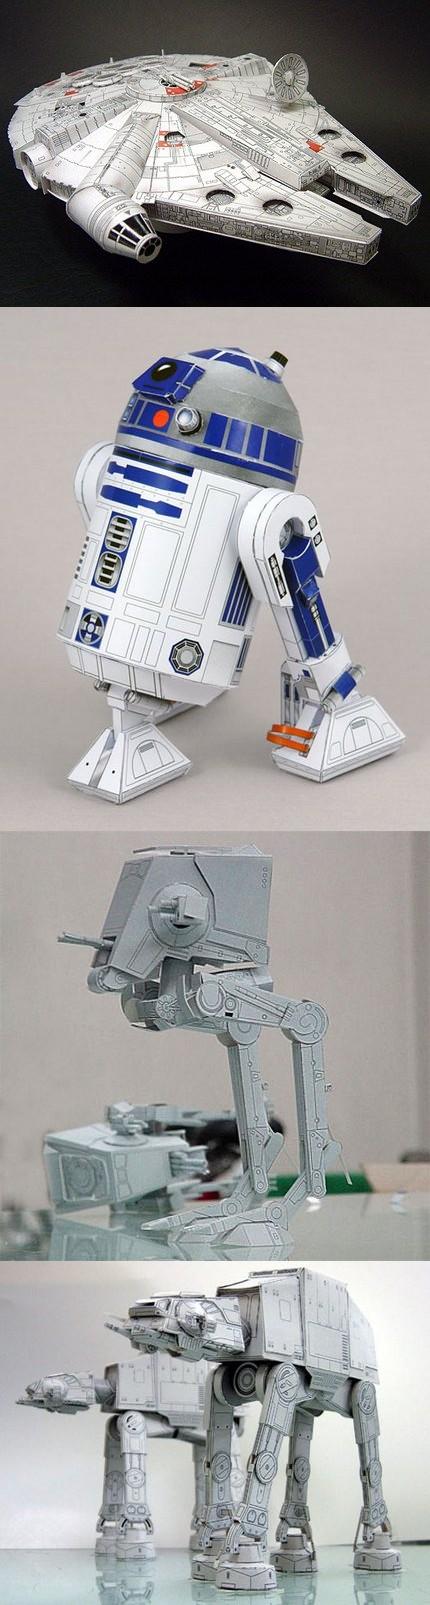 Modele din Star Wars